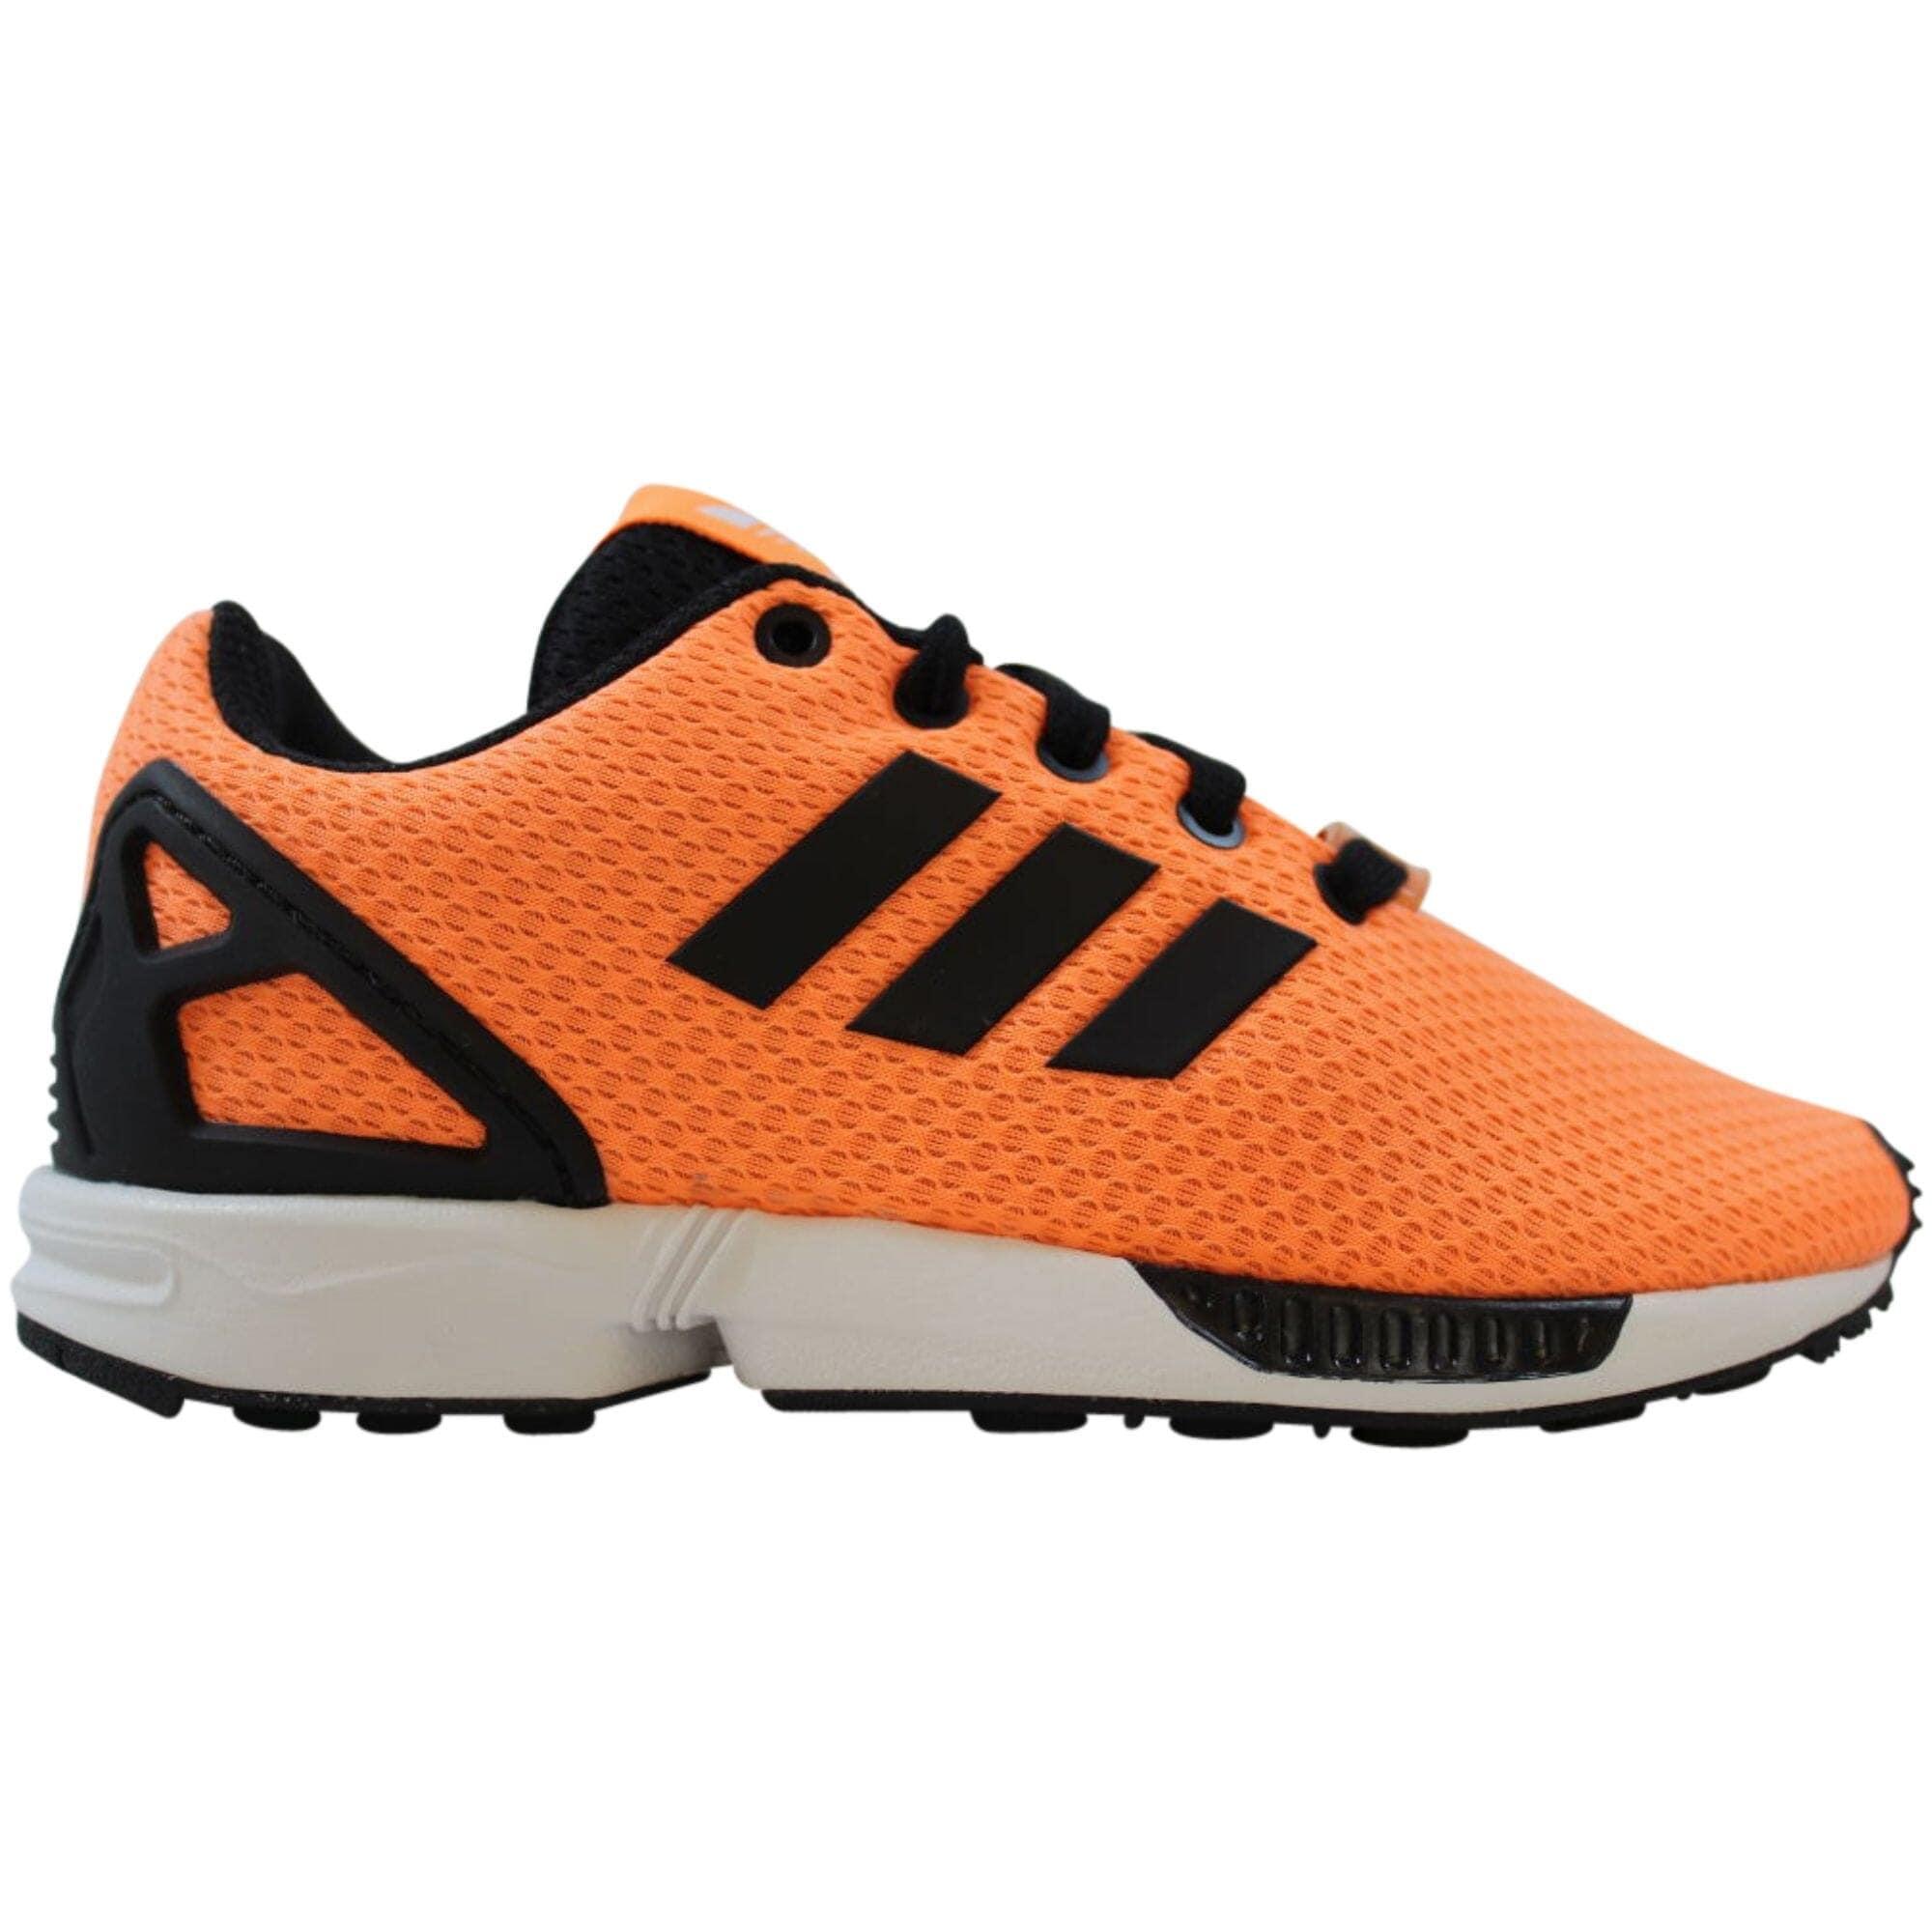 Adidas ZX Flux K Flag Orange/Core Black-Footwear White M19388 Toddler